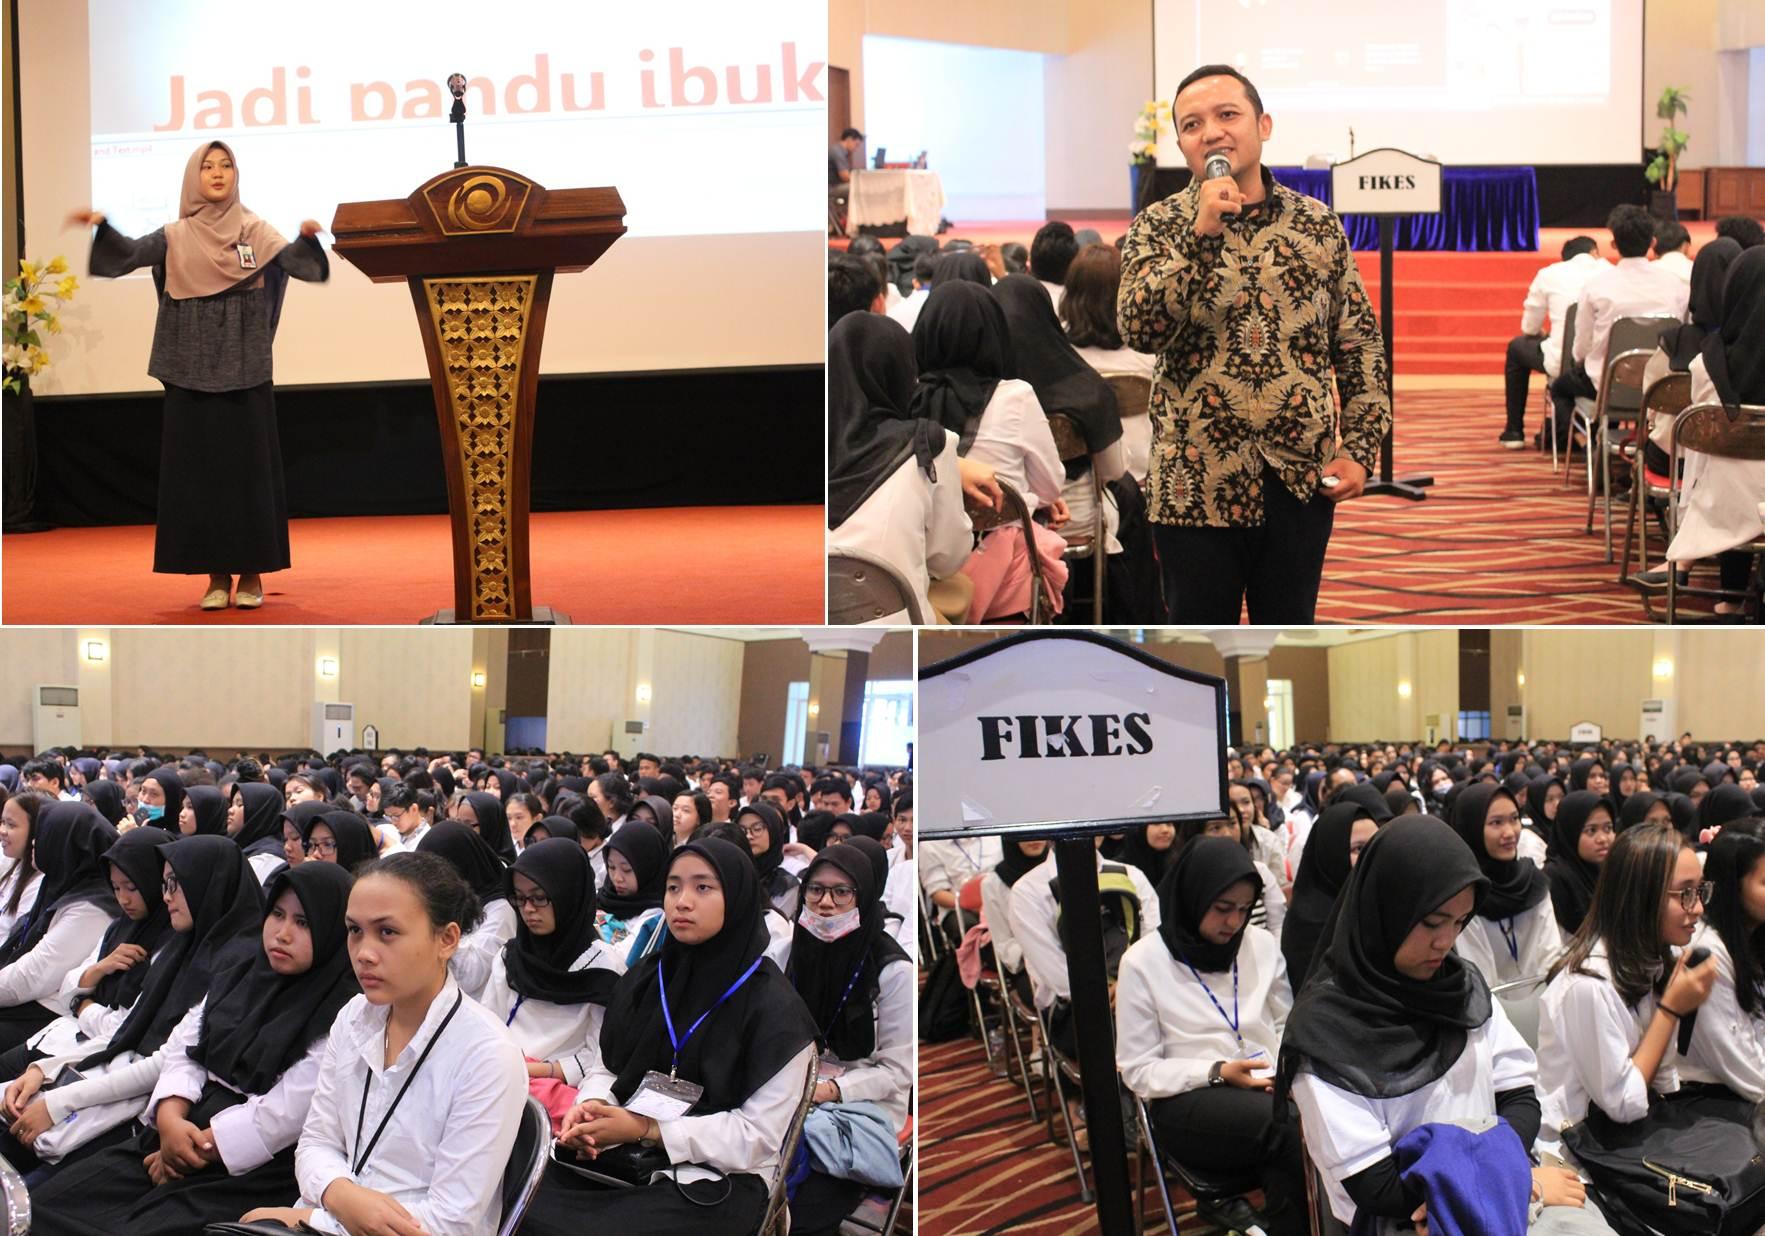 Serangkaian acara dalam Pre University mulai dari Menyanyikan Lagu Indonesia Raya hingg mendengarkan Pemateri